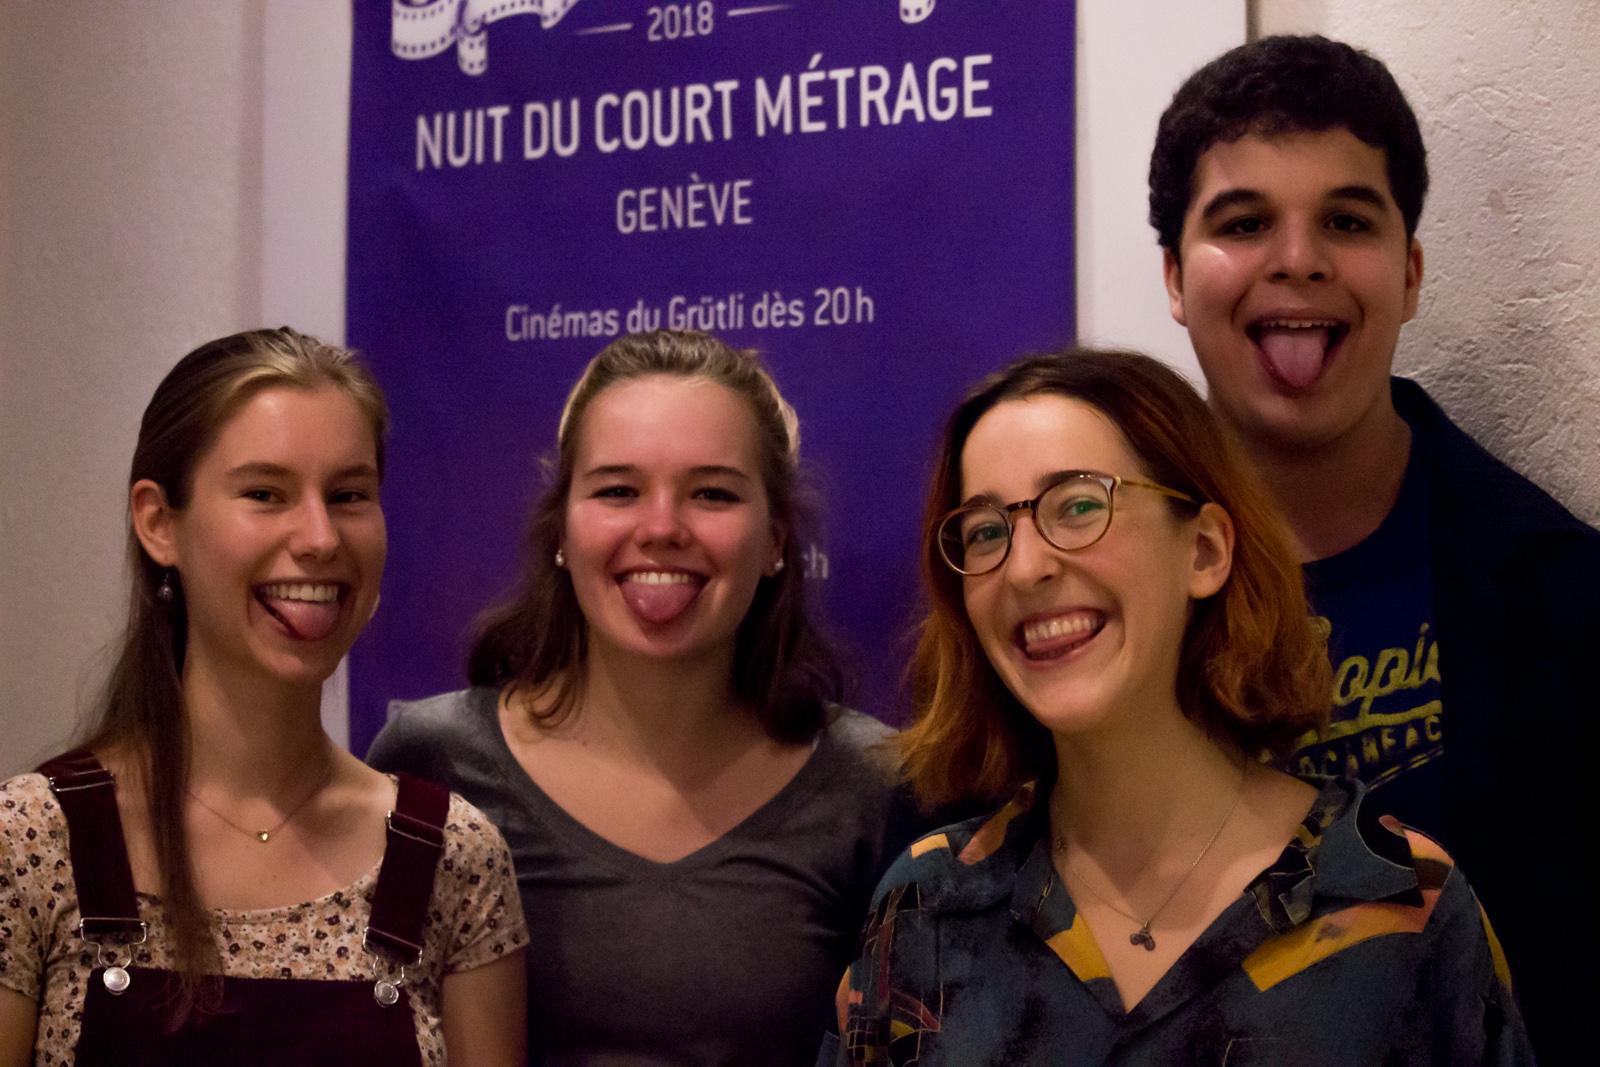 IMG_9051_NDC18_2018-09-21_Geneve_©SergeMabuya_Jury-des-jeunes.jpg